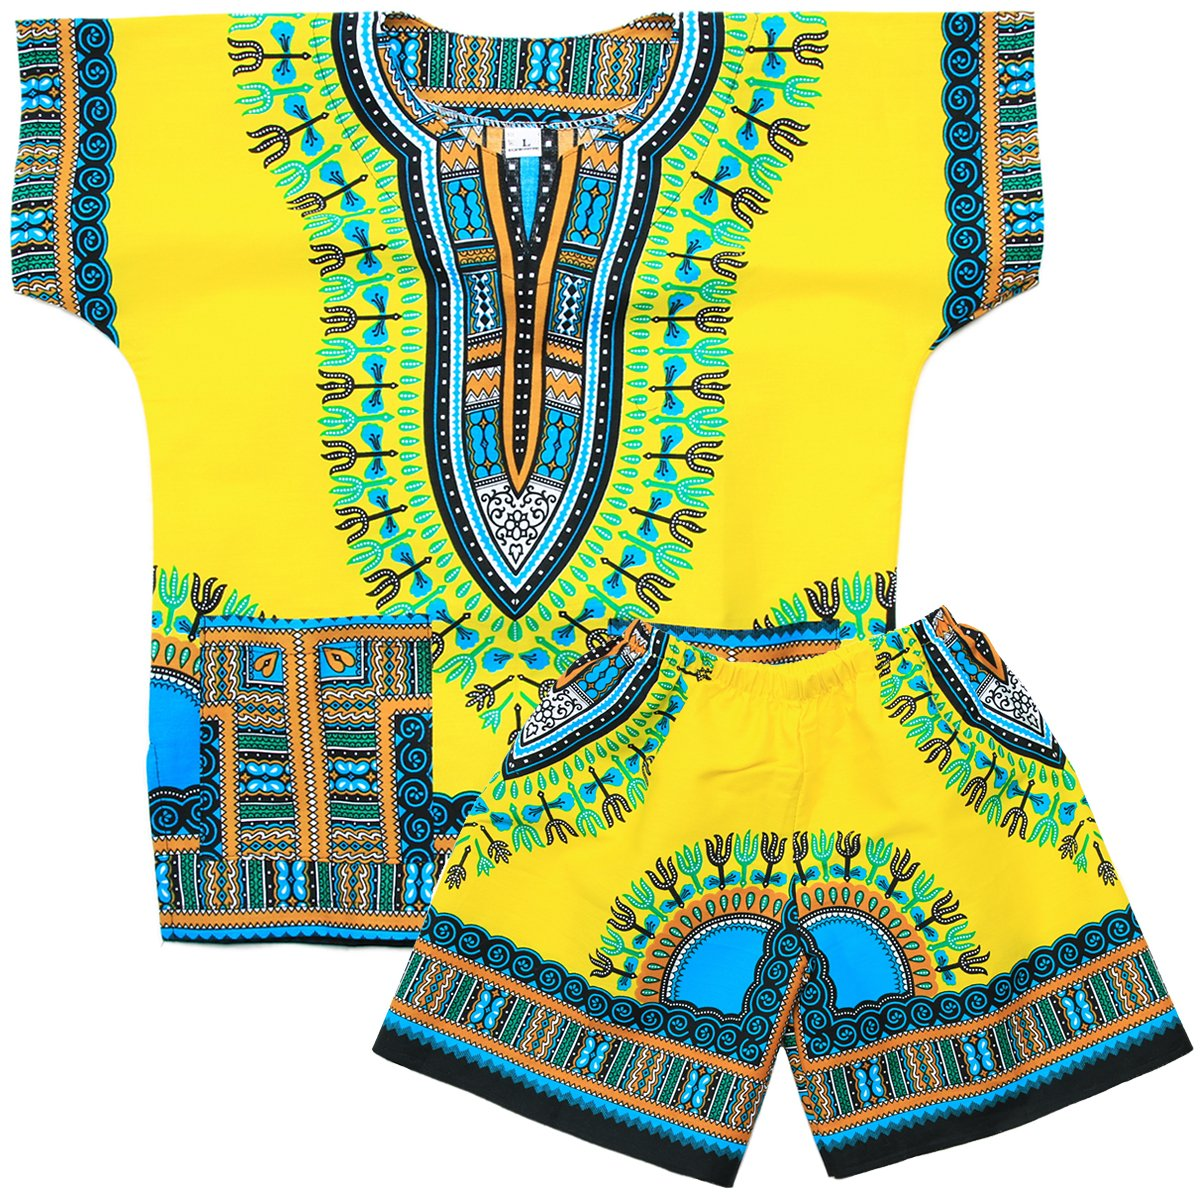 Cotton Kids African Mexican Toddler Boys Girls Dashiki /& Shorts Set bm011y